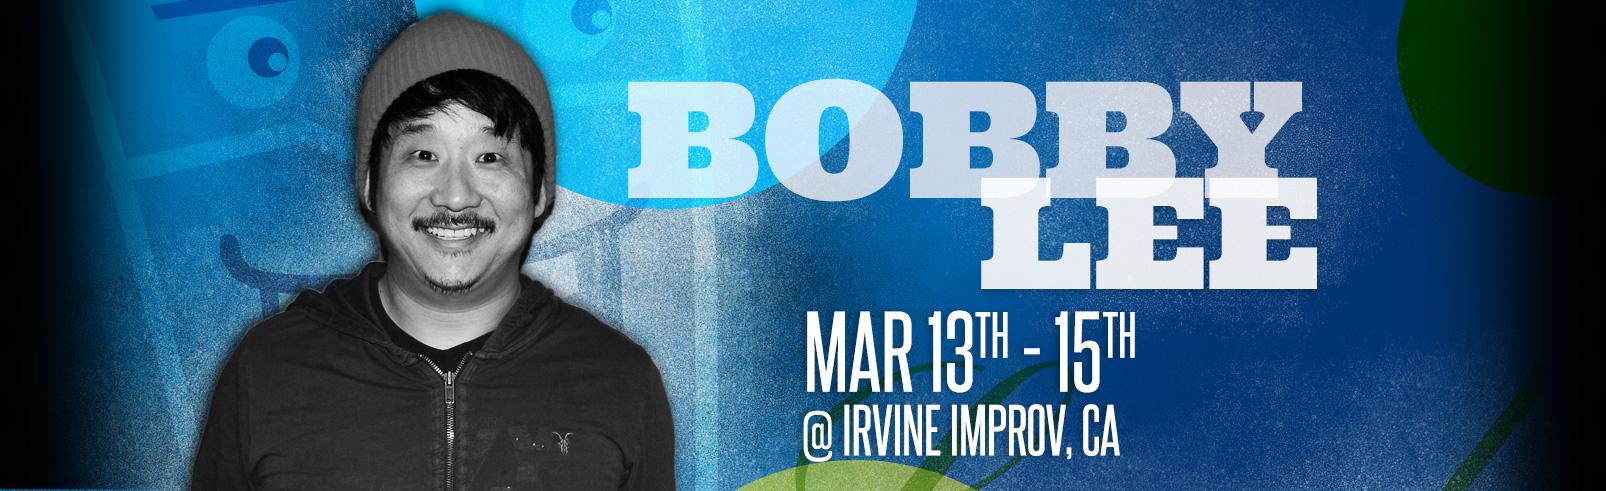 Bobby Lee @ Irvine Improv